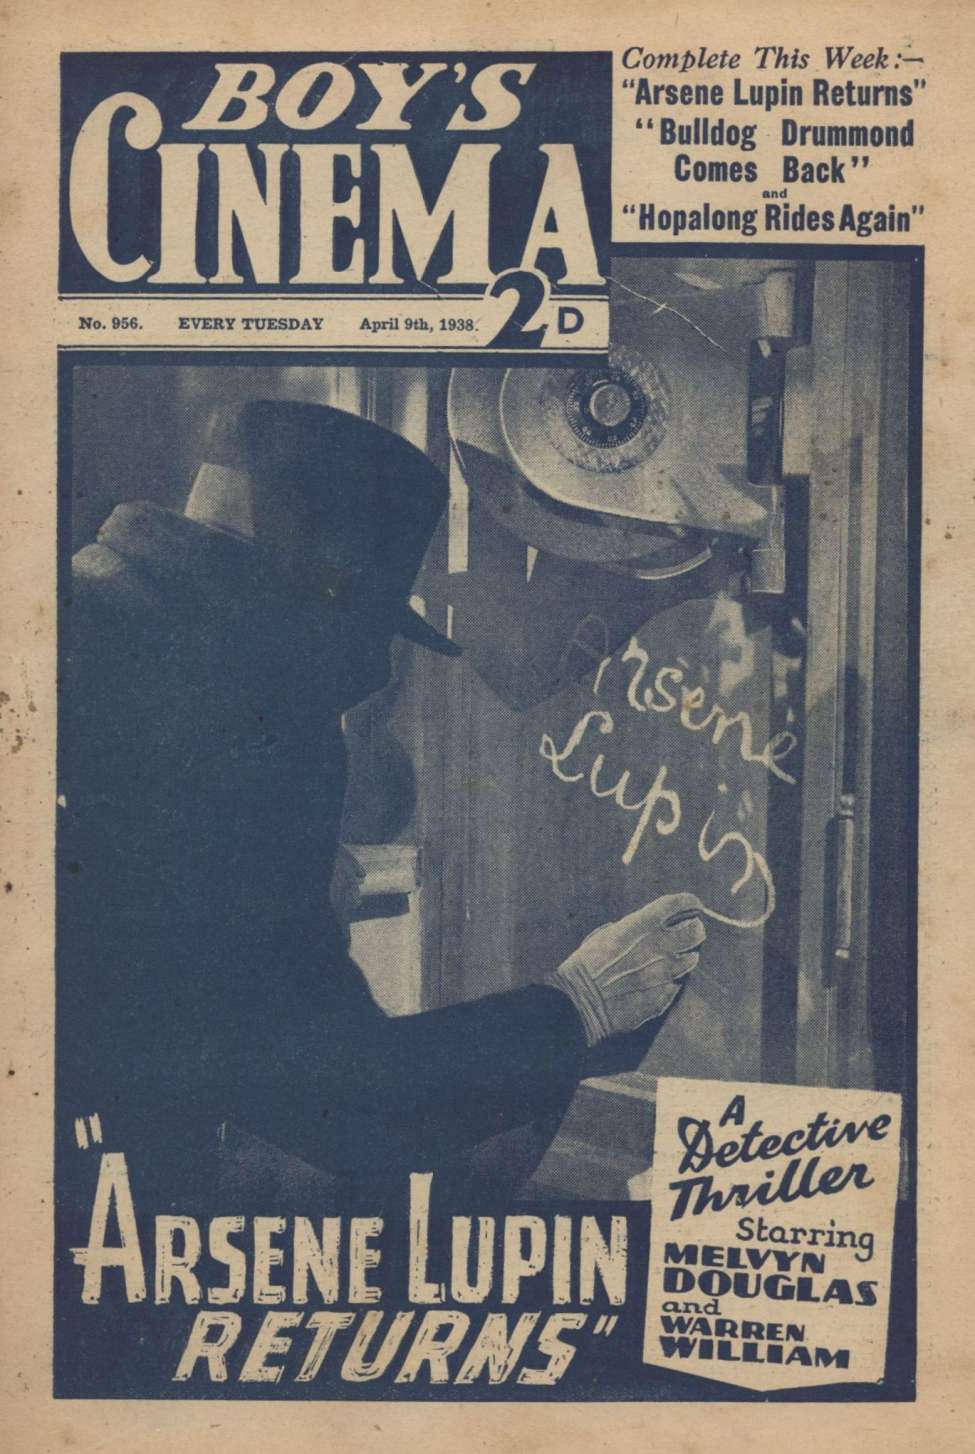 Comic Book Cover For Boy's Cinema 0956 - Arsene Lupin Returns starring Melvyn Douglas